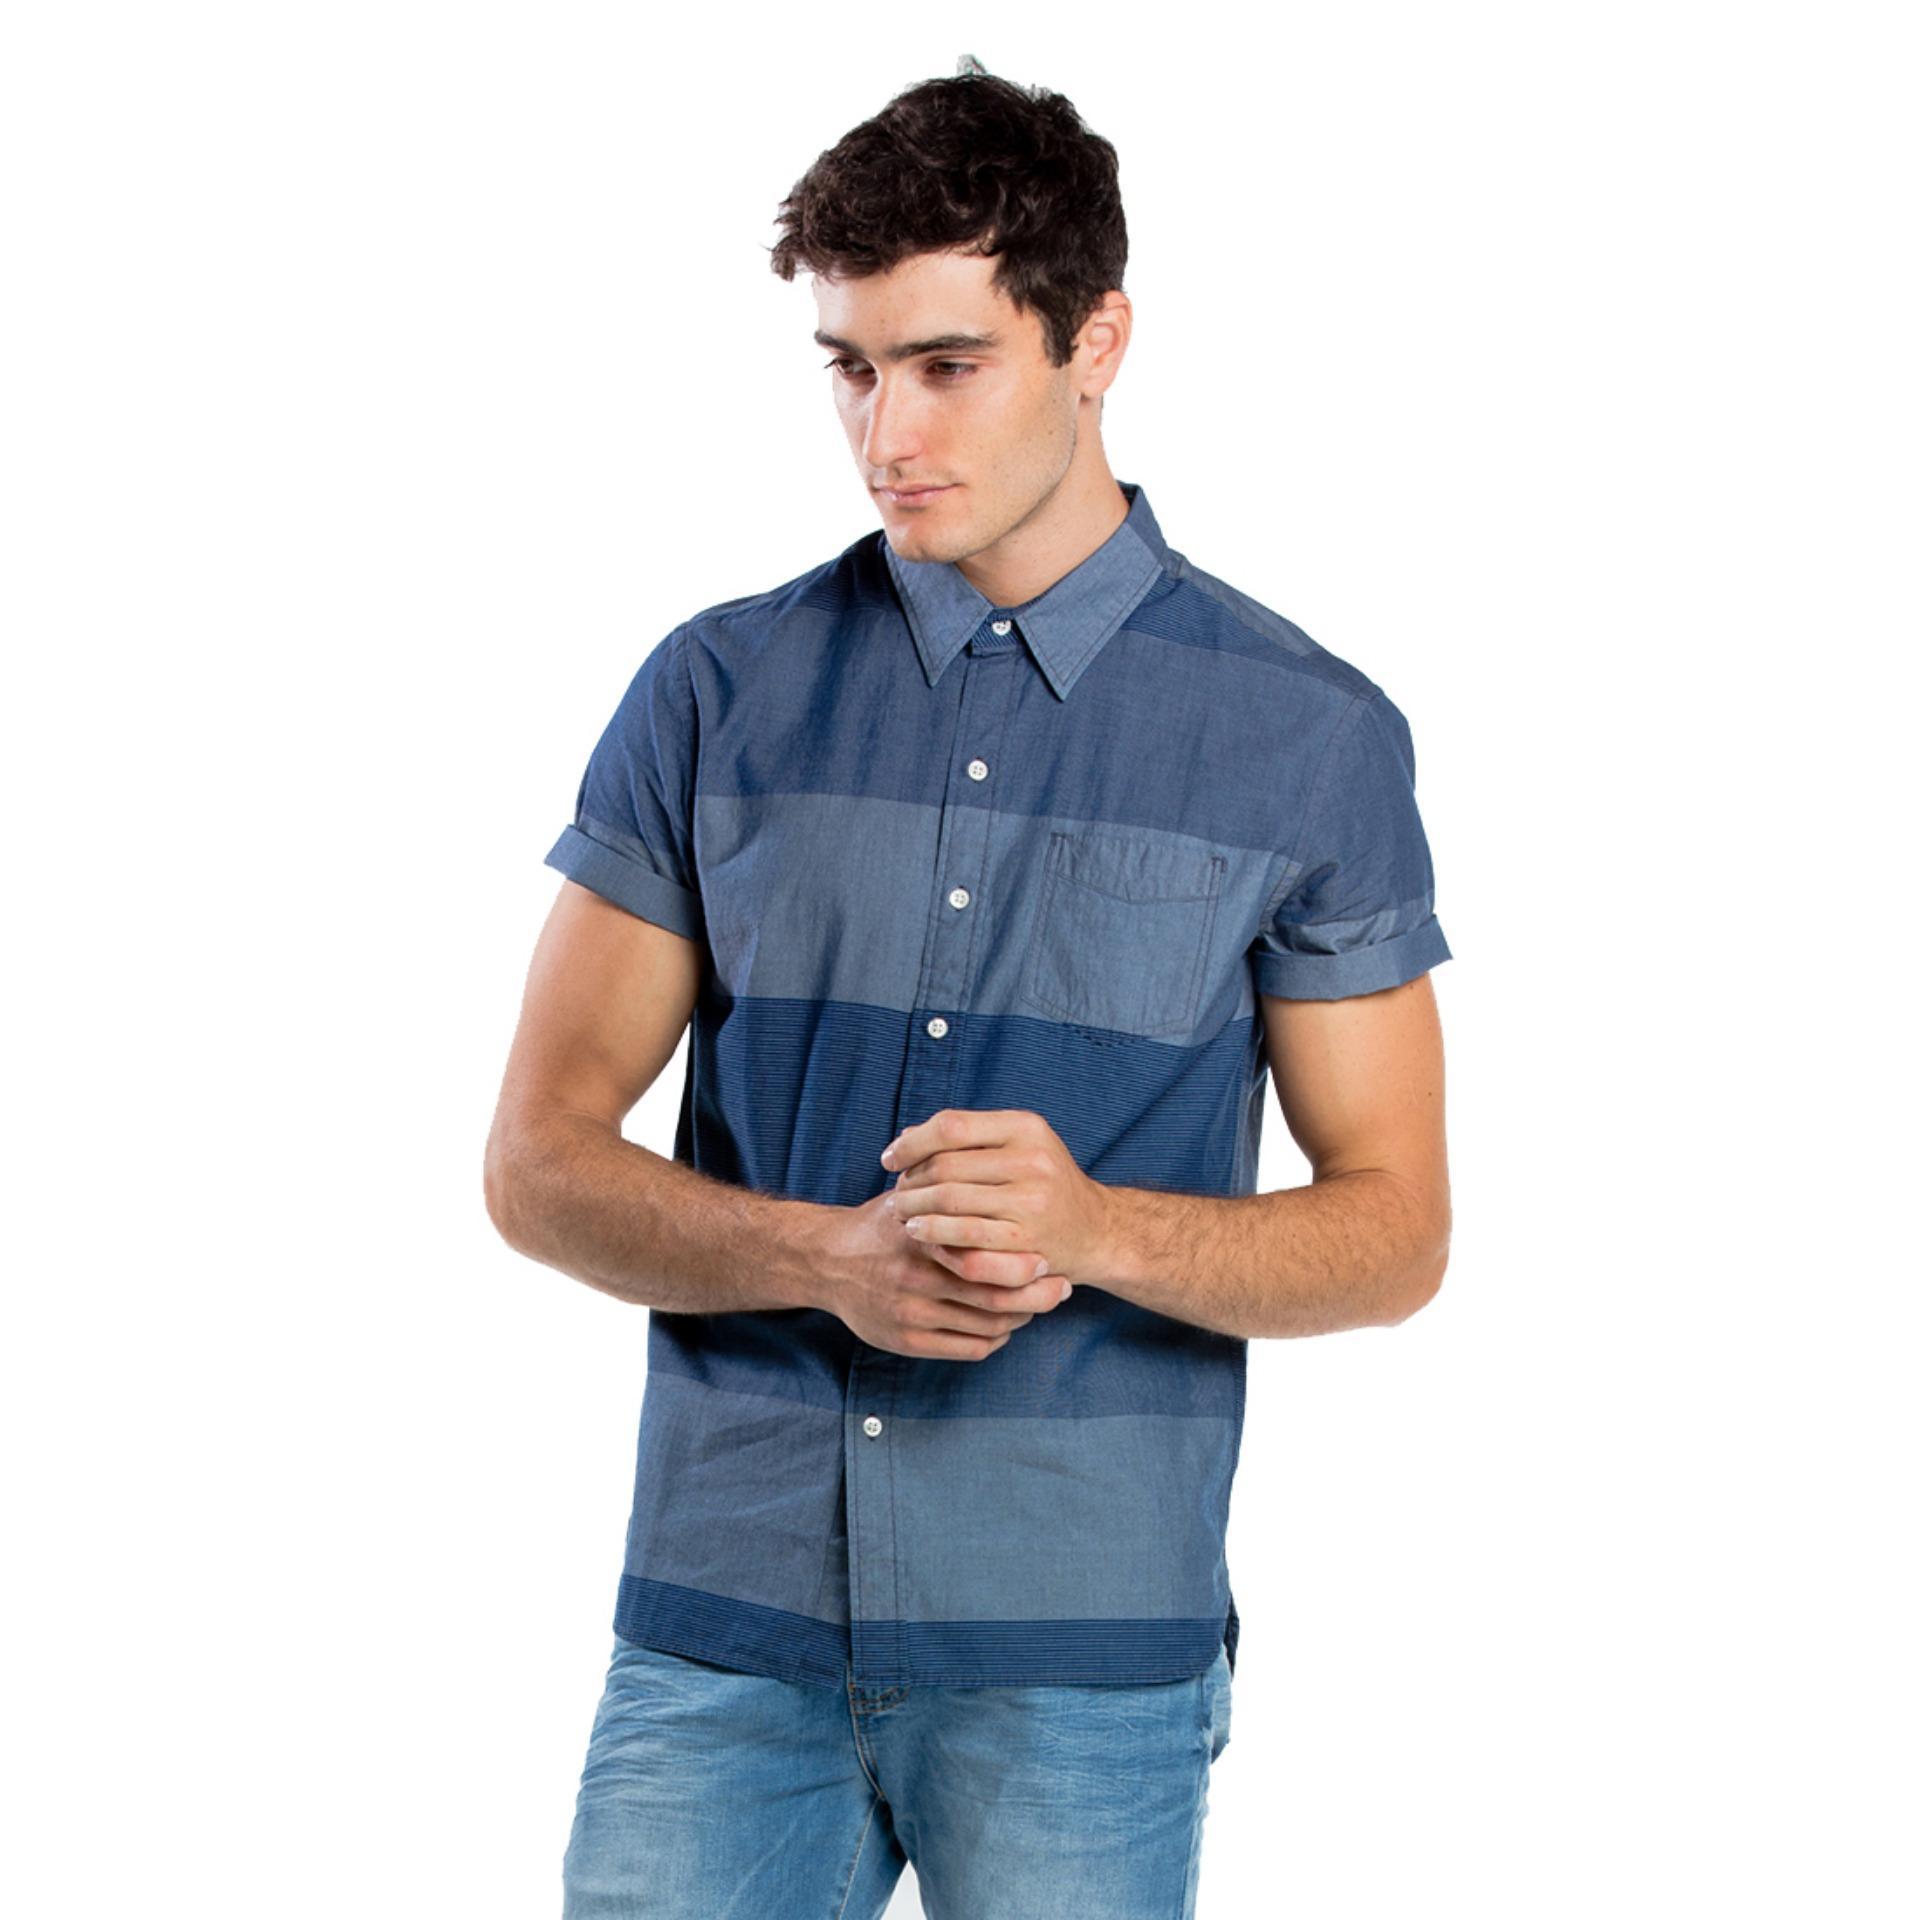 Levi's Sunset One Pocket - Shirt Brawley Indigo St - Levi'S Performance Cool 505 Regular Fit Jeans - Kula Kangri RAYA LVSBDAY